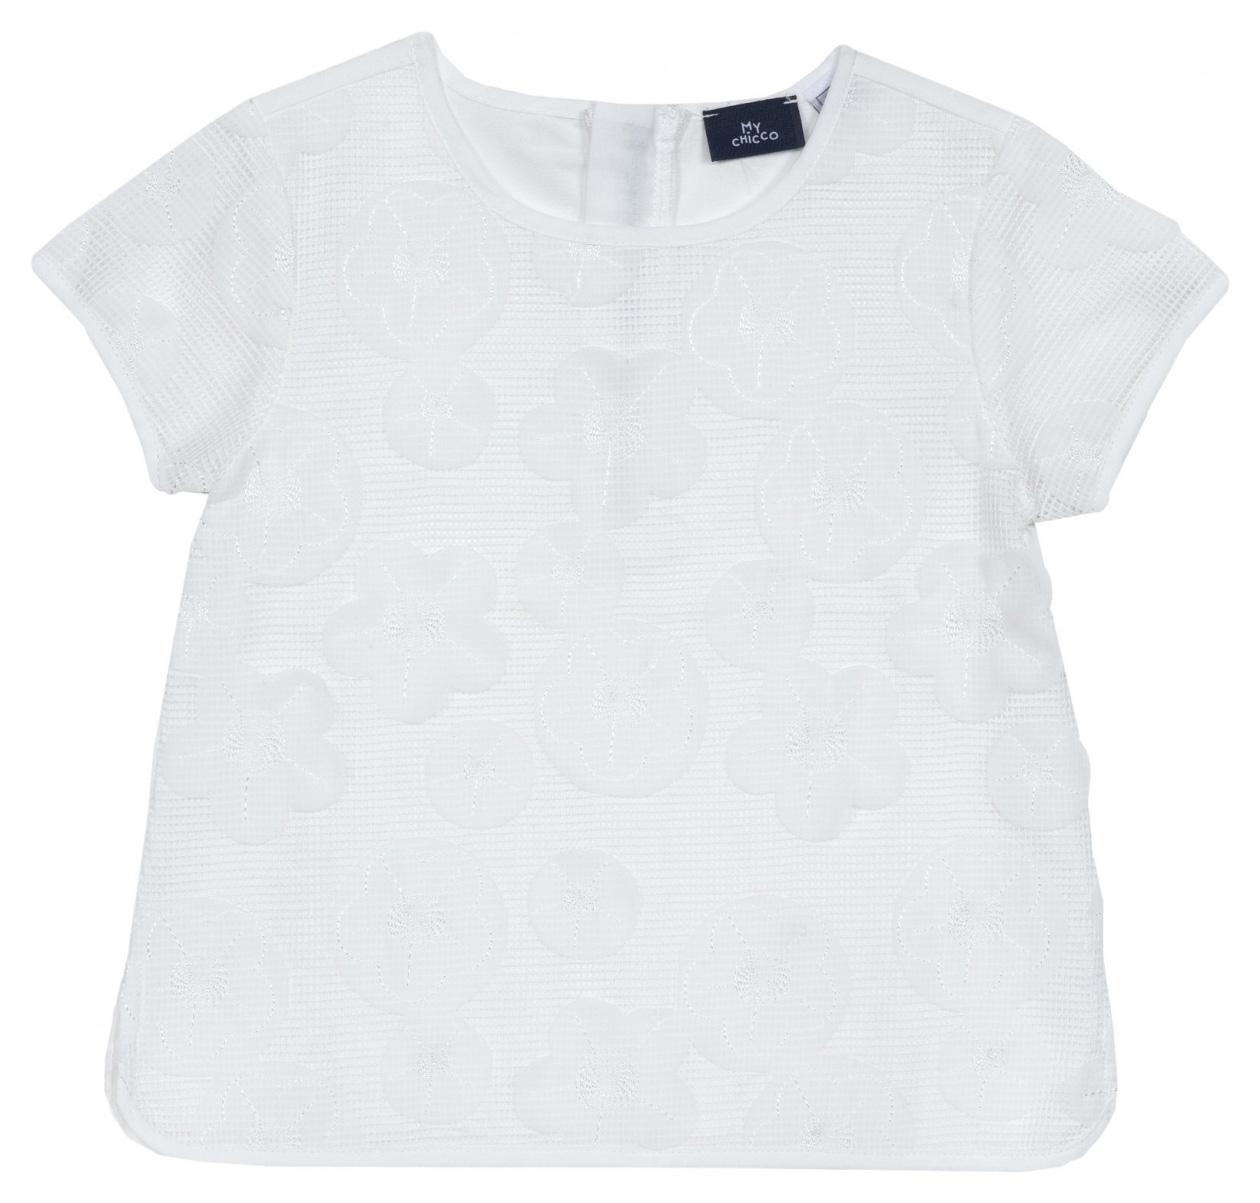 Блузка Chicco, р.92, цвет белый